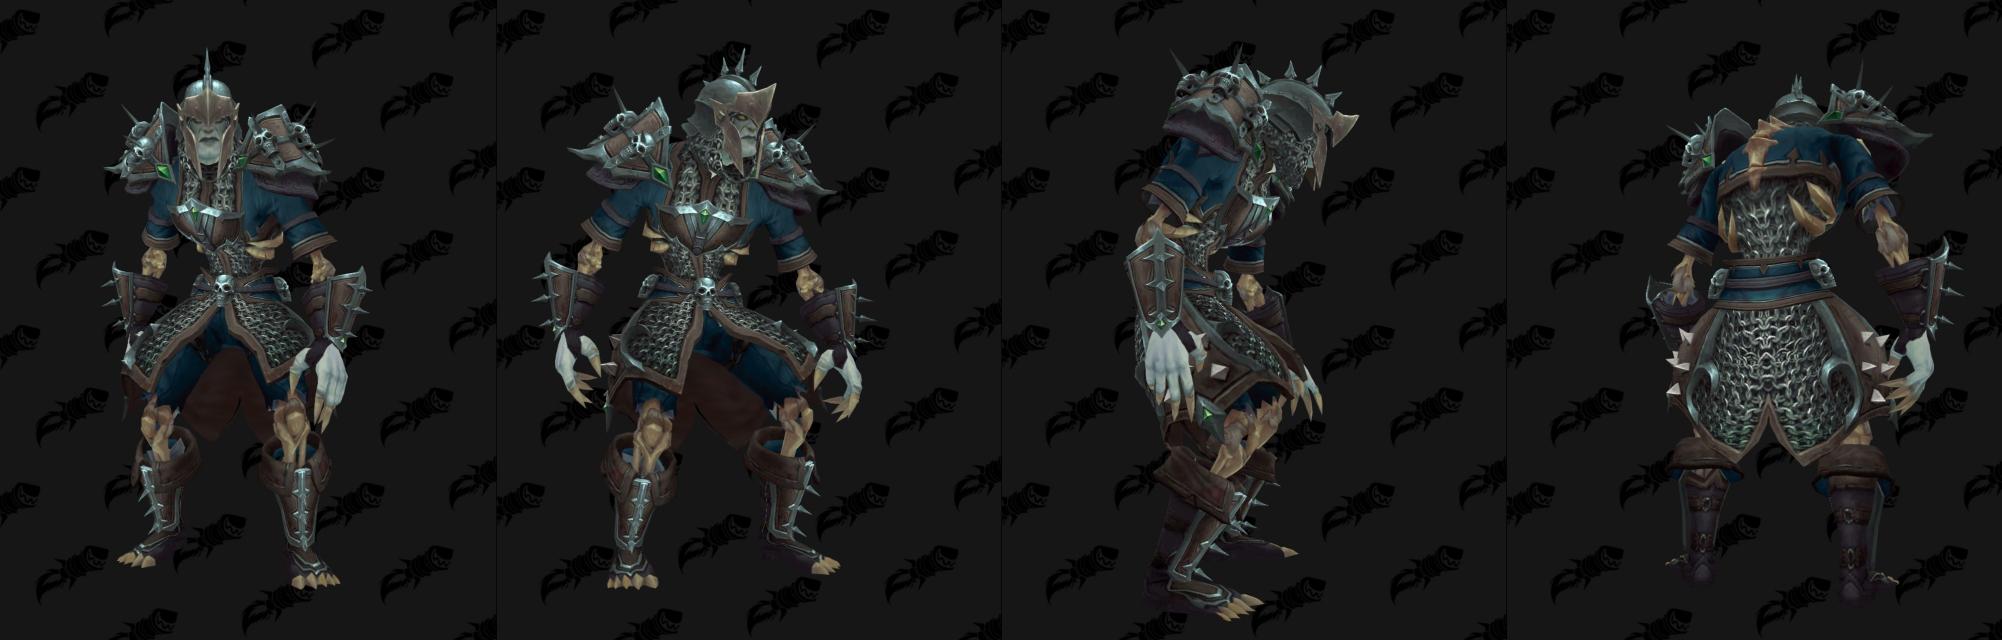 Armure Mailles Horde - Front de guerre Sombrivage Tier 3